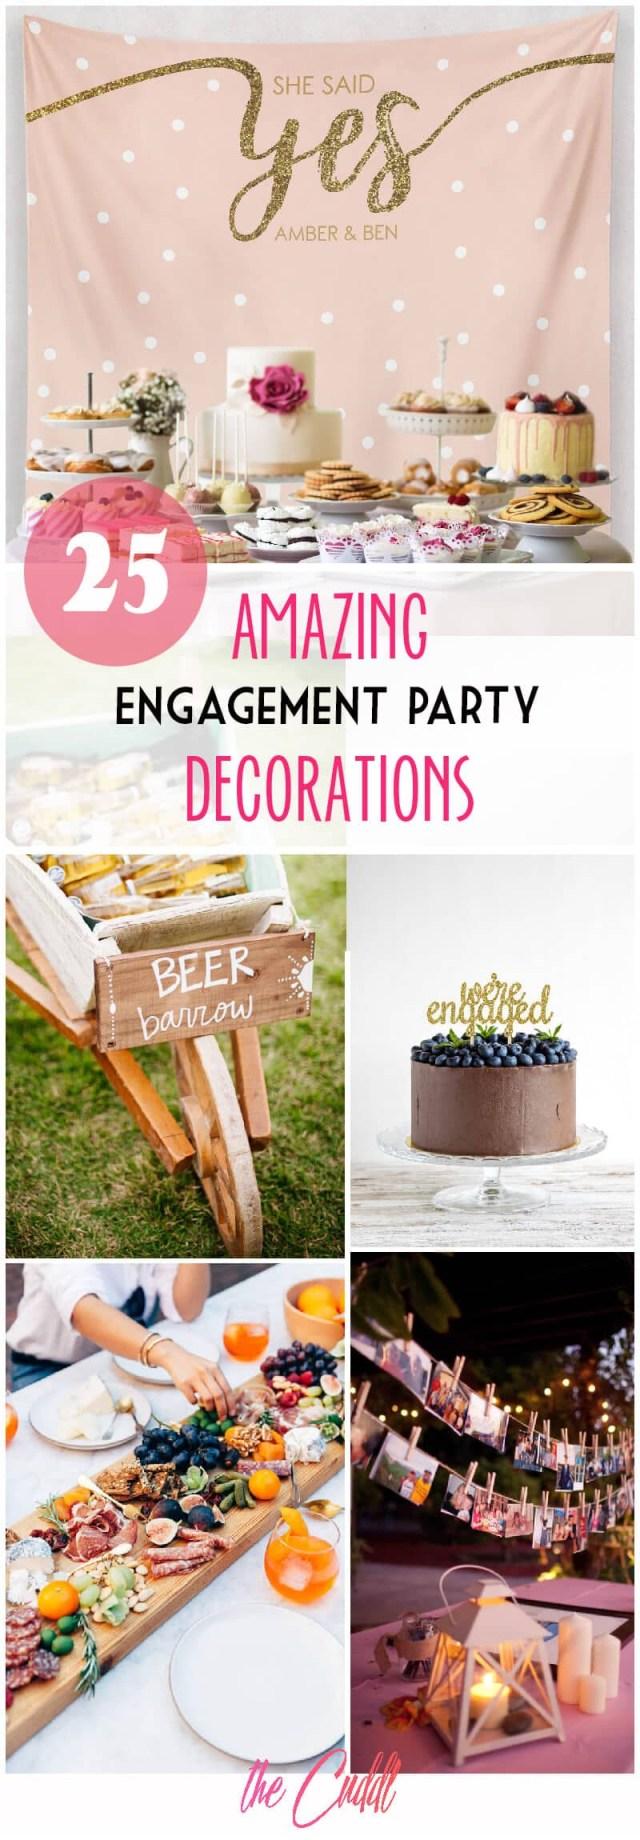 Rustic Engagement Party Ideas 25 Amazing Diy Engagement Party Decoration Ideas For 2019